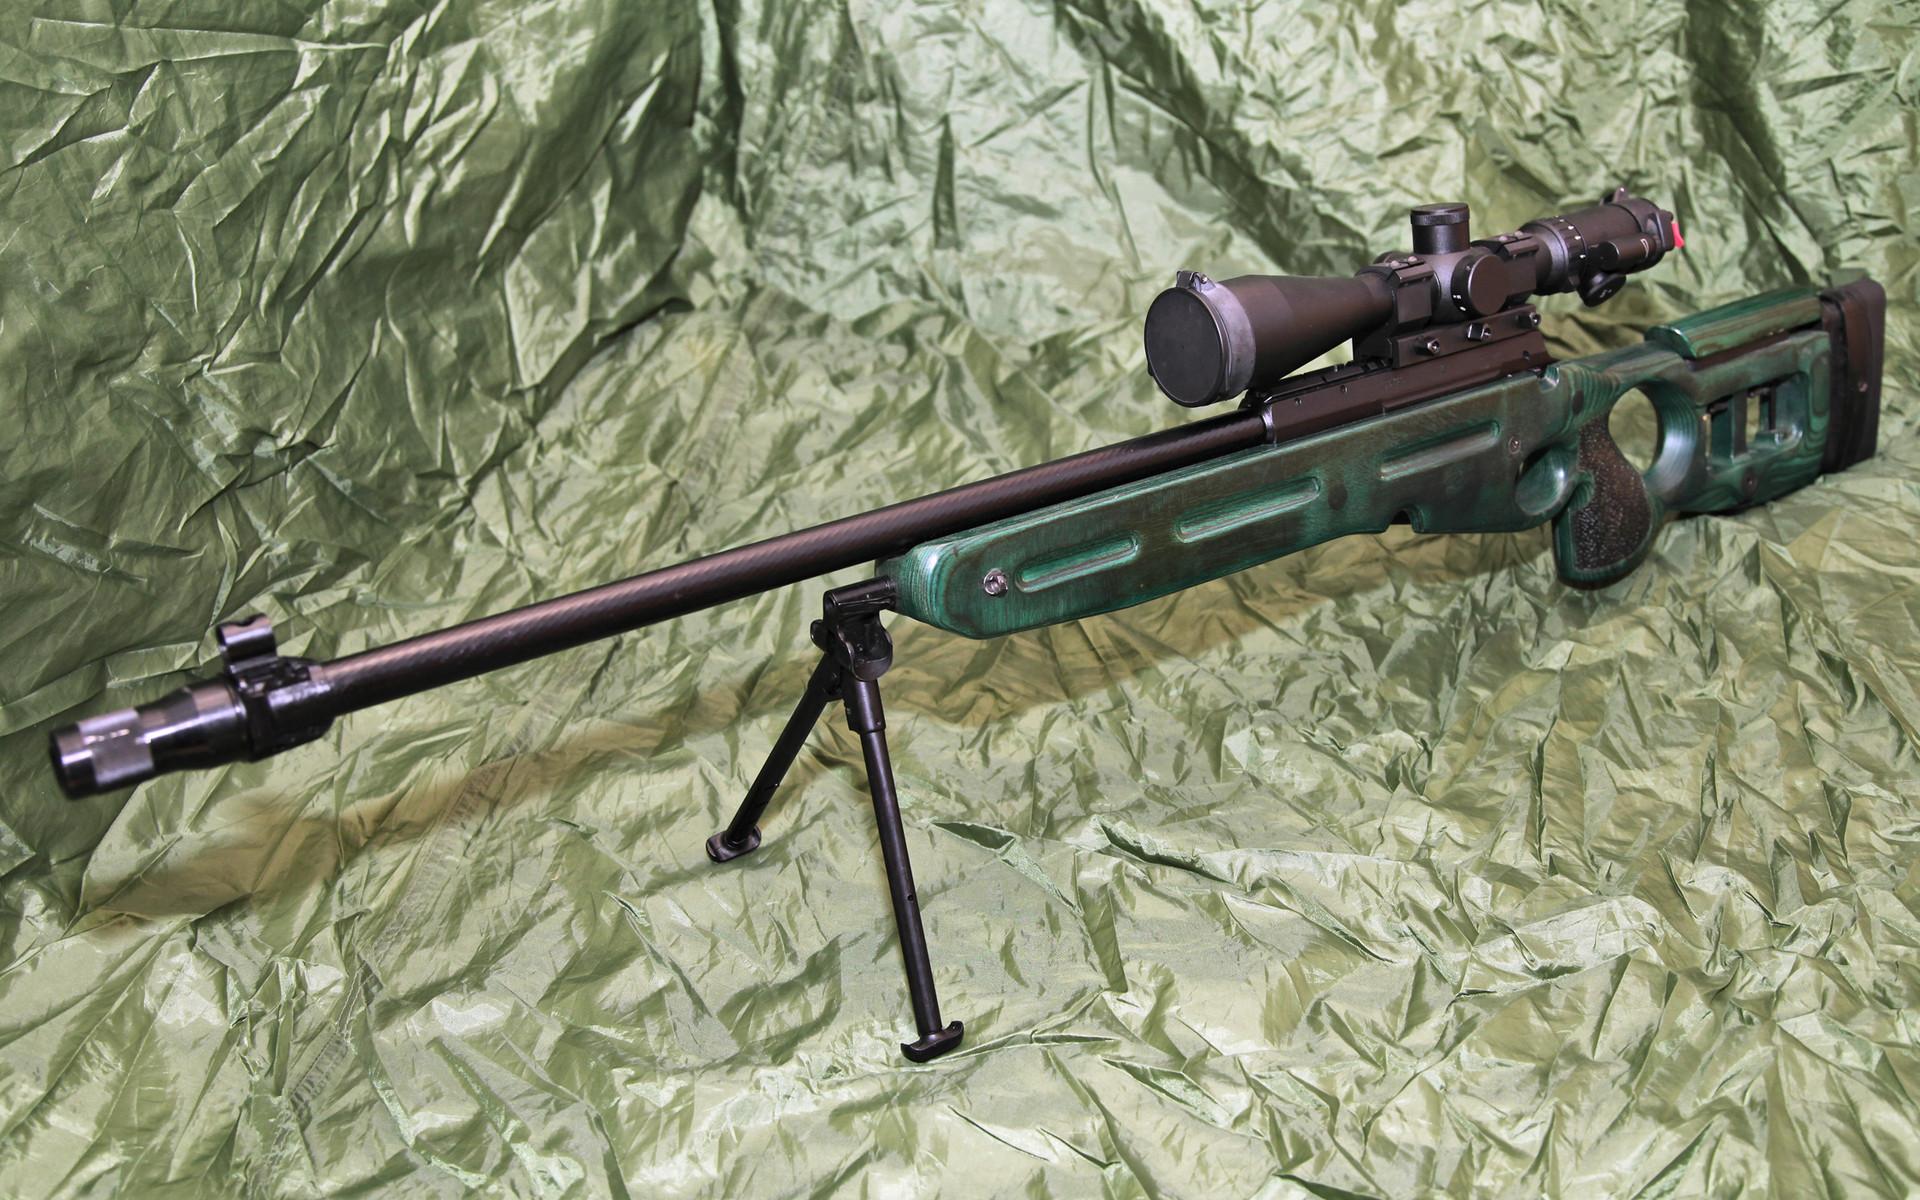 1920x1080 L96A1 Sniper Rifle Wallpapers HD Wallpaper Downloads